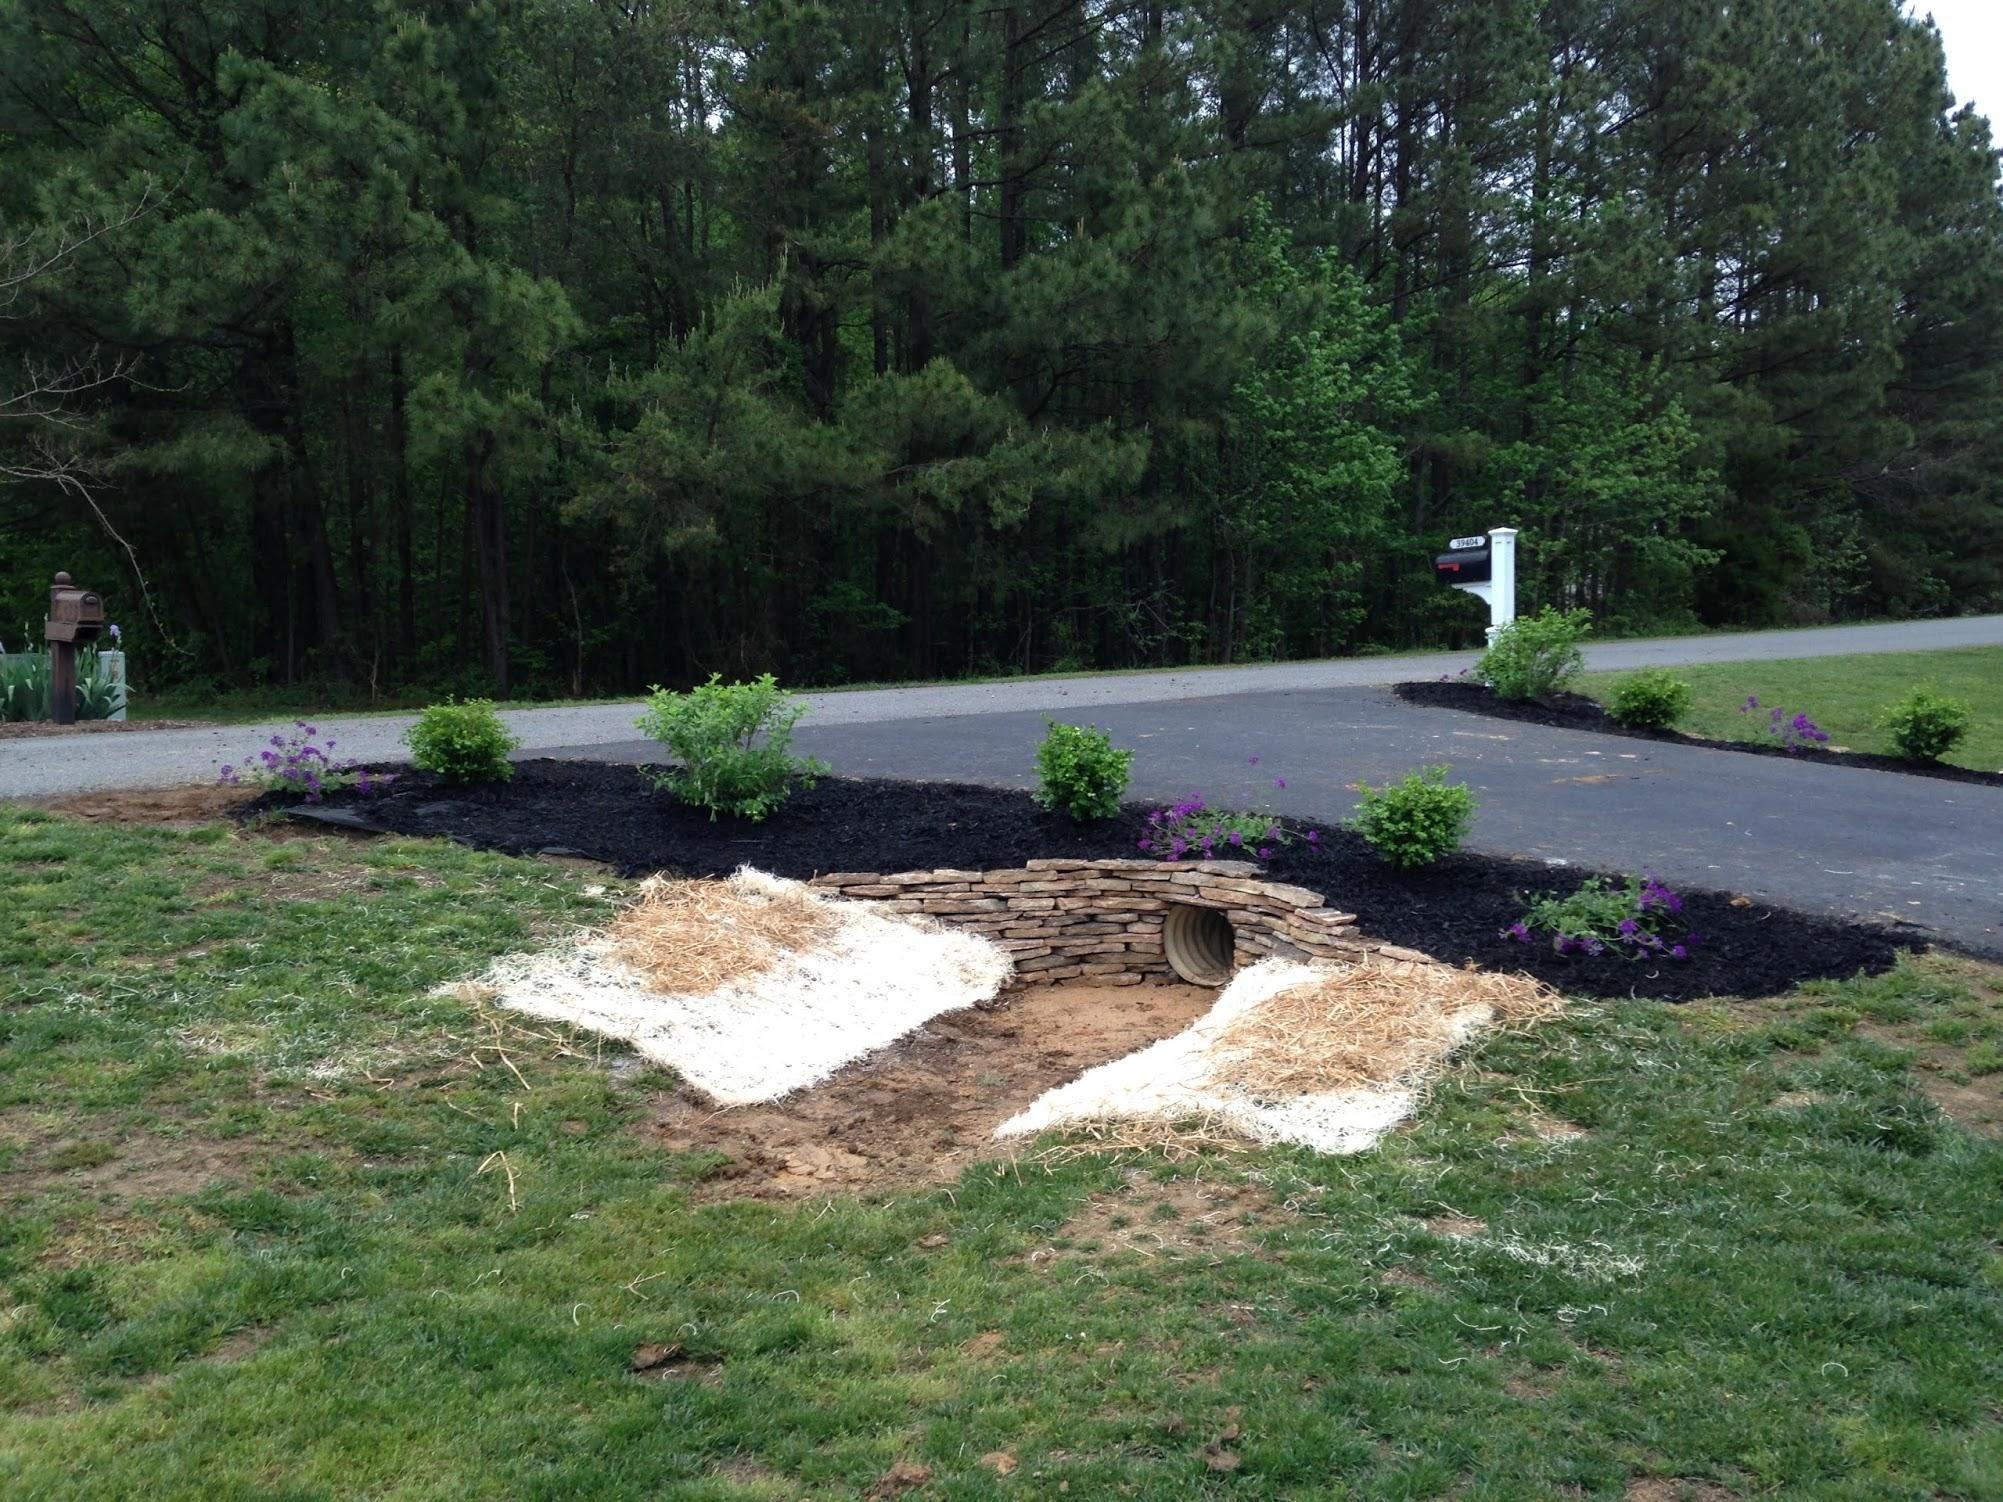 Driveway Culvert Landscaping | Driveways, Landscaping and Garden art